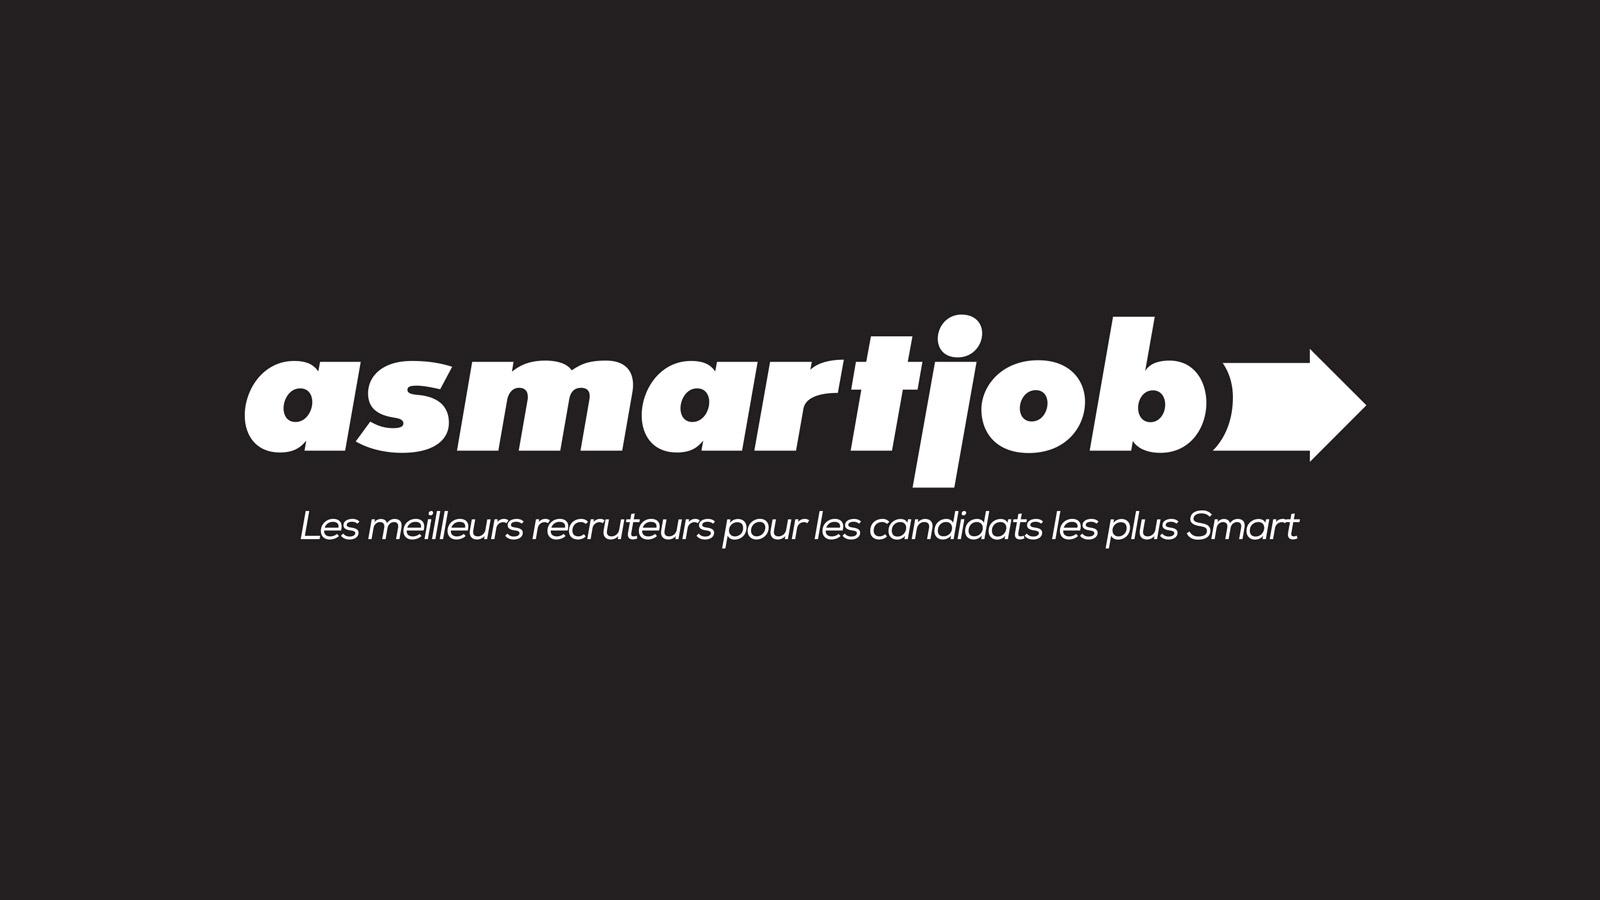 sublime-digital_branding_a-smart-job-05